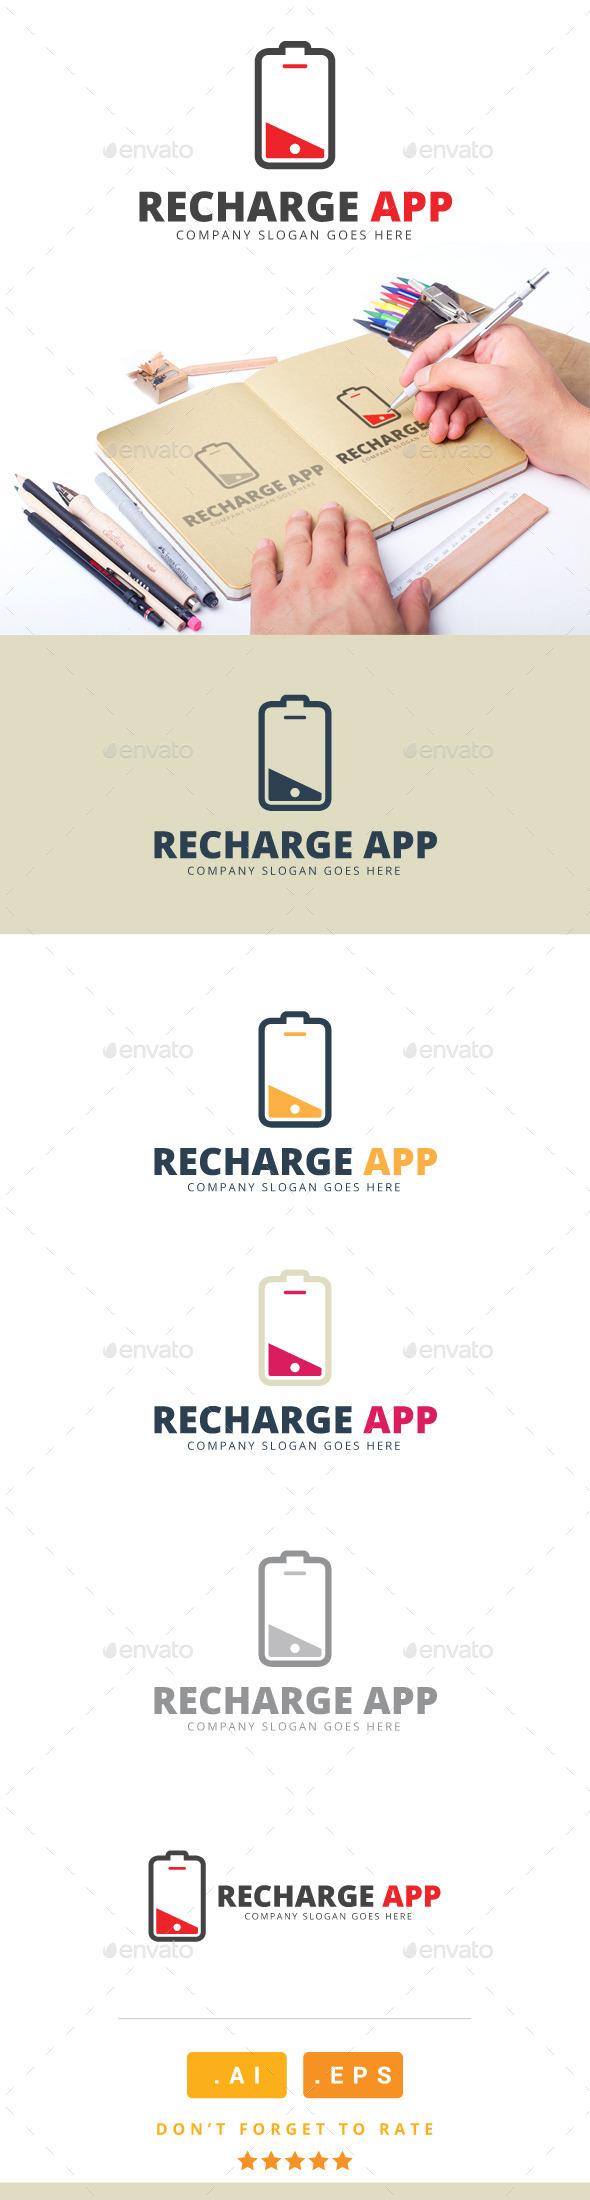 Recharge App Logo